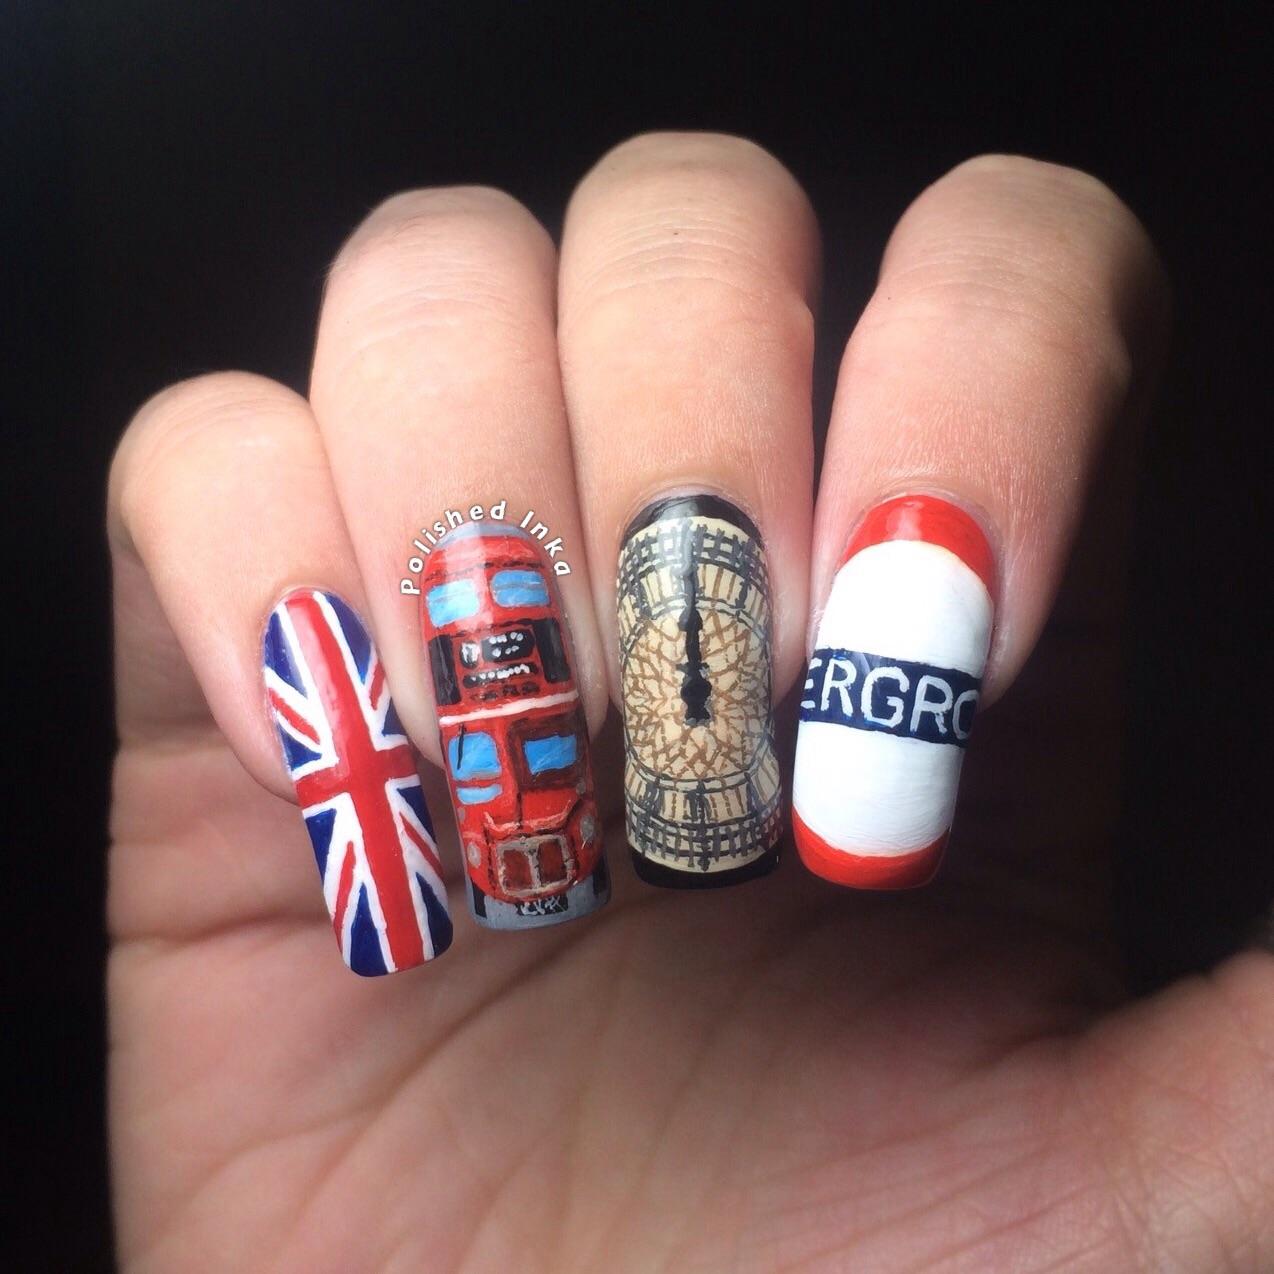 London themed nail art polished inka london nail art prinsesfo Images